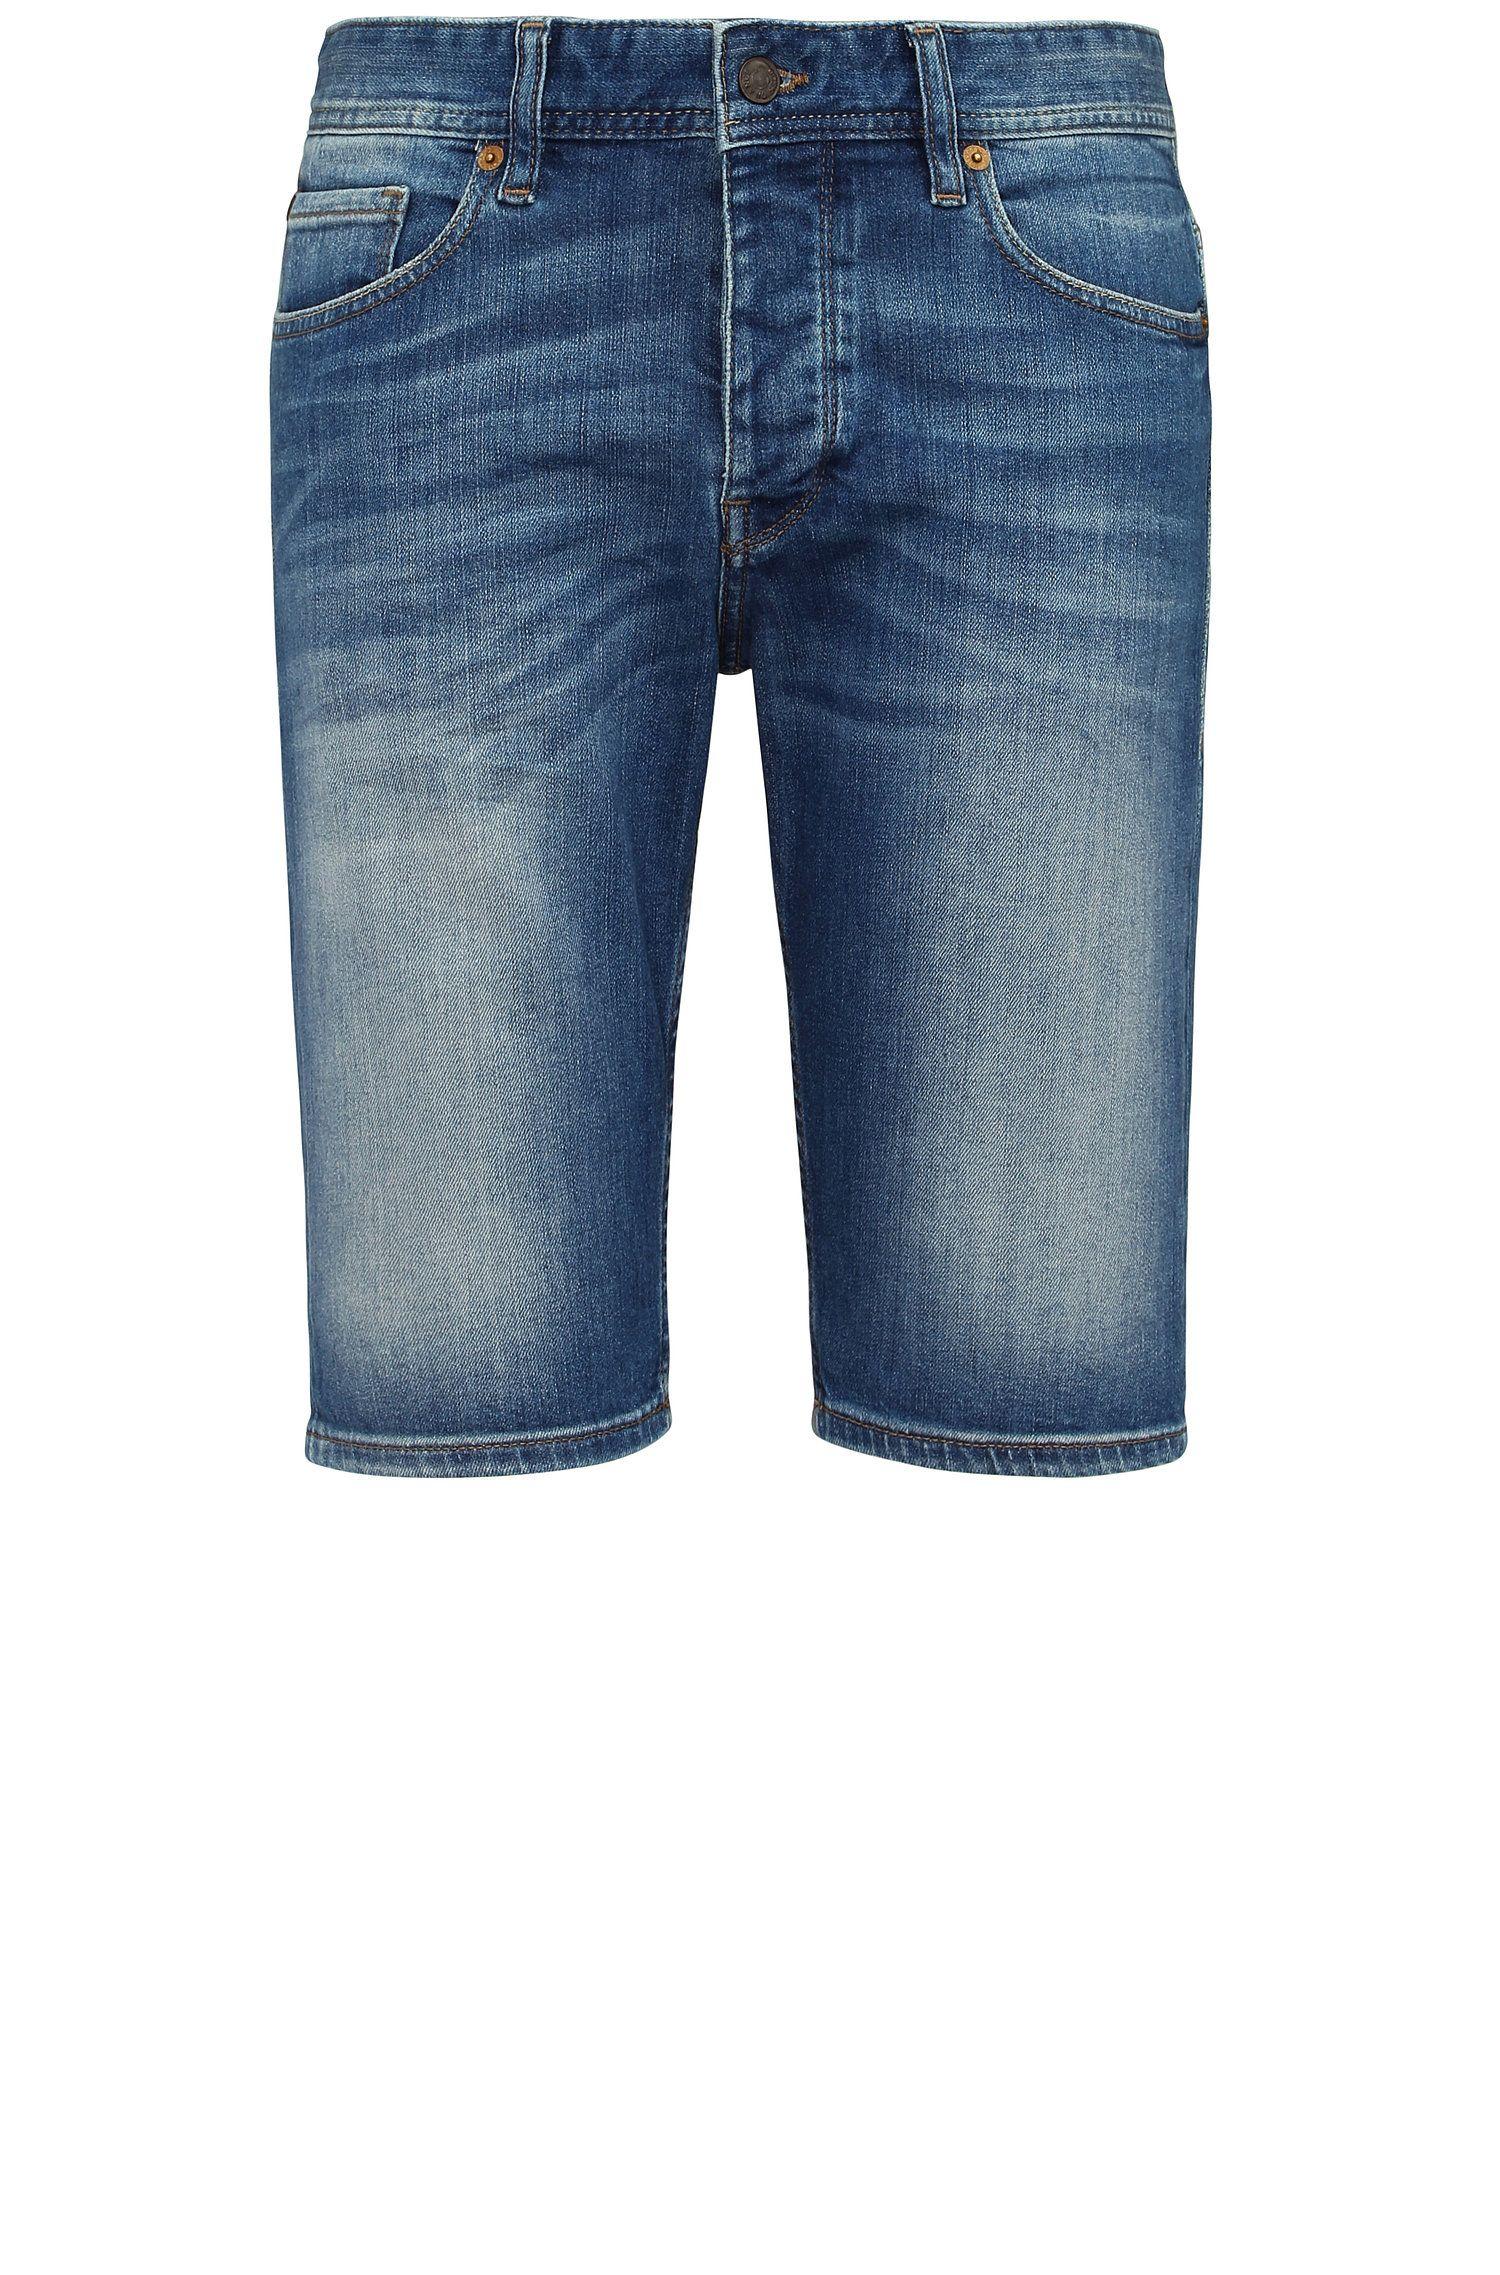 'Orange 90 Short'   Stretch Cotton, 11 oz Denim Shorts